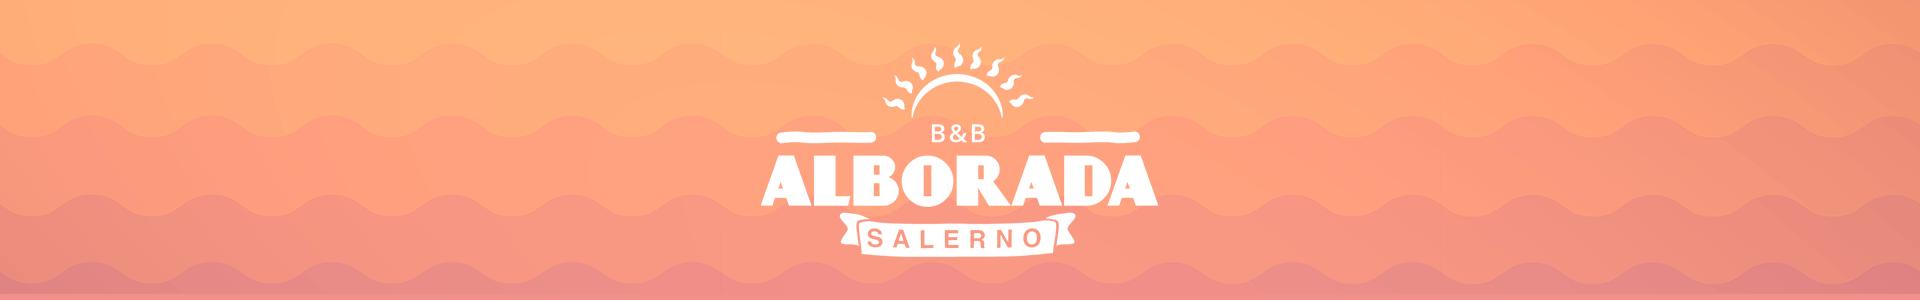 Alborada_Banner